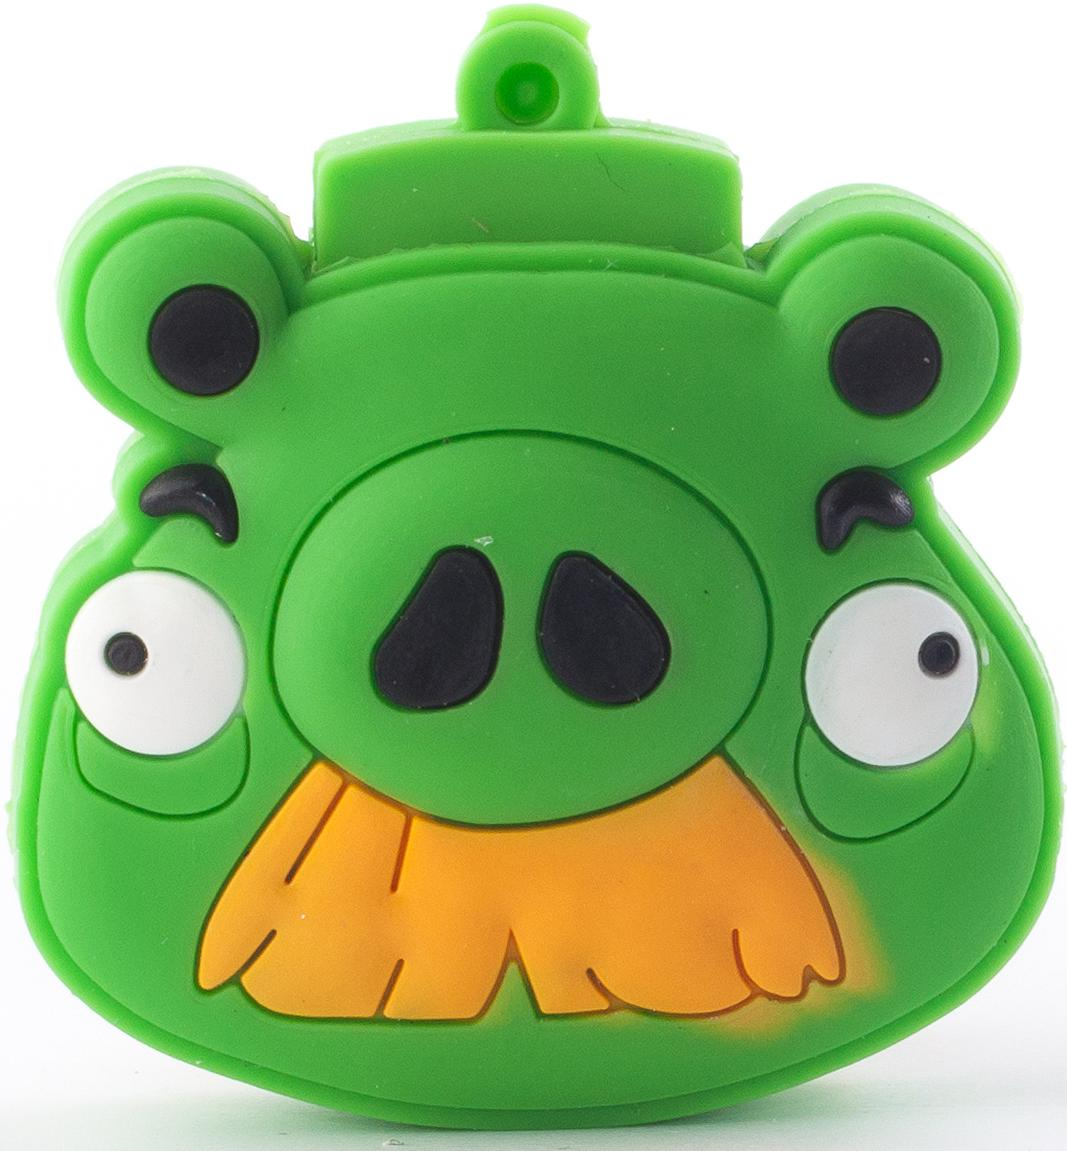 Купить USB Flash Drive Angry Birds MD 196